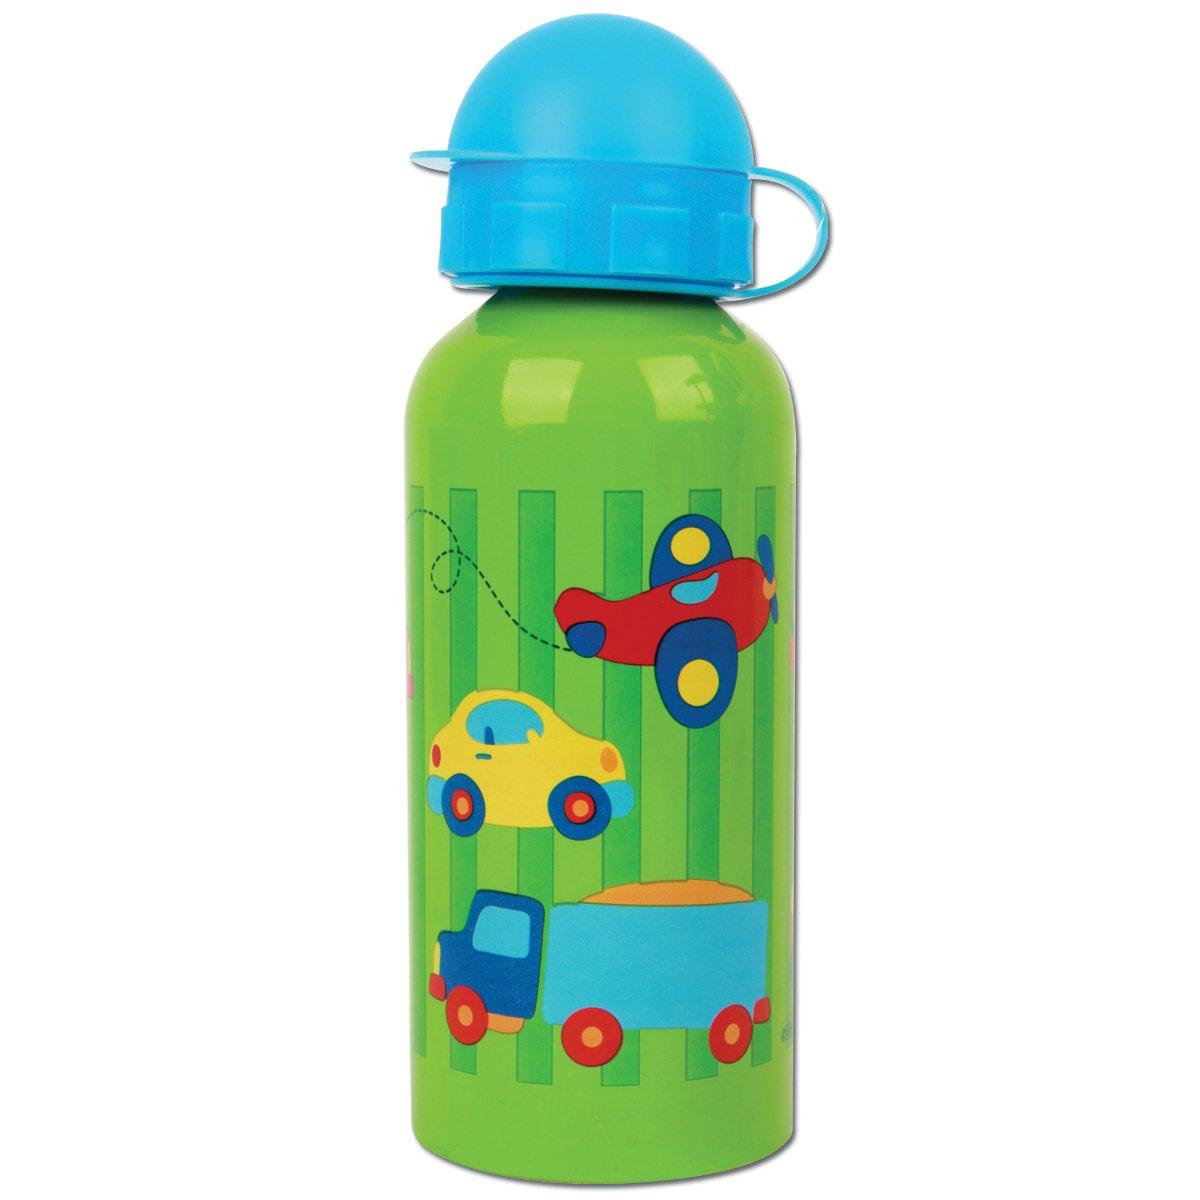 Stephen Joseph SJ950162 Trinkflasche, rostfr. Edelstahl, Verkehr